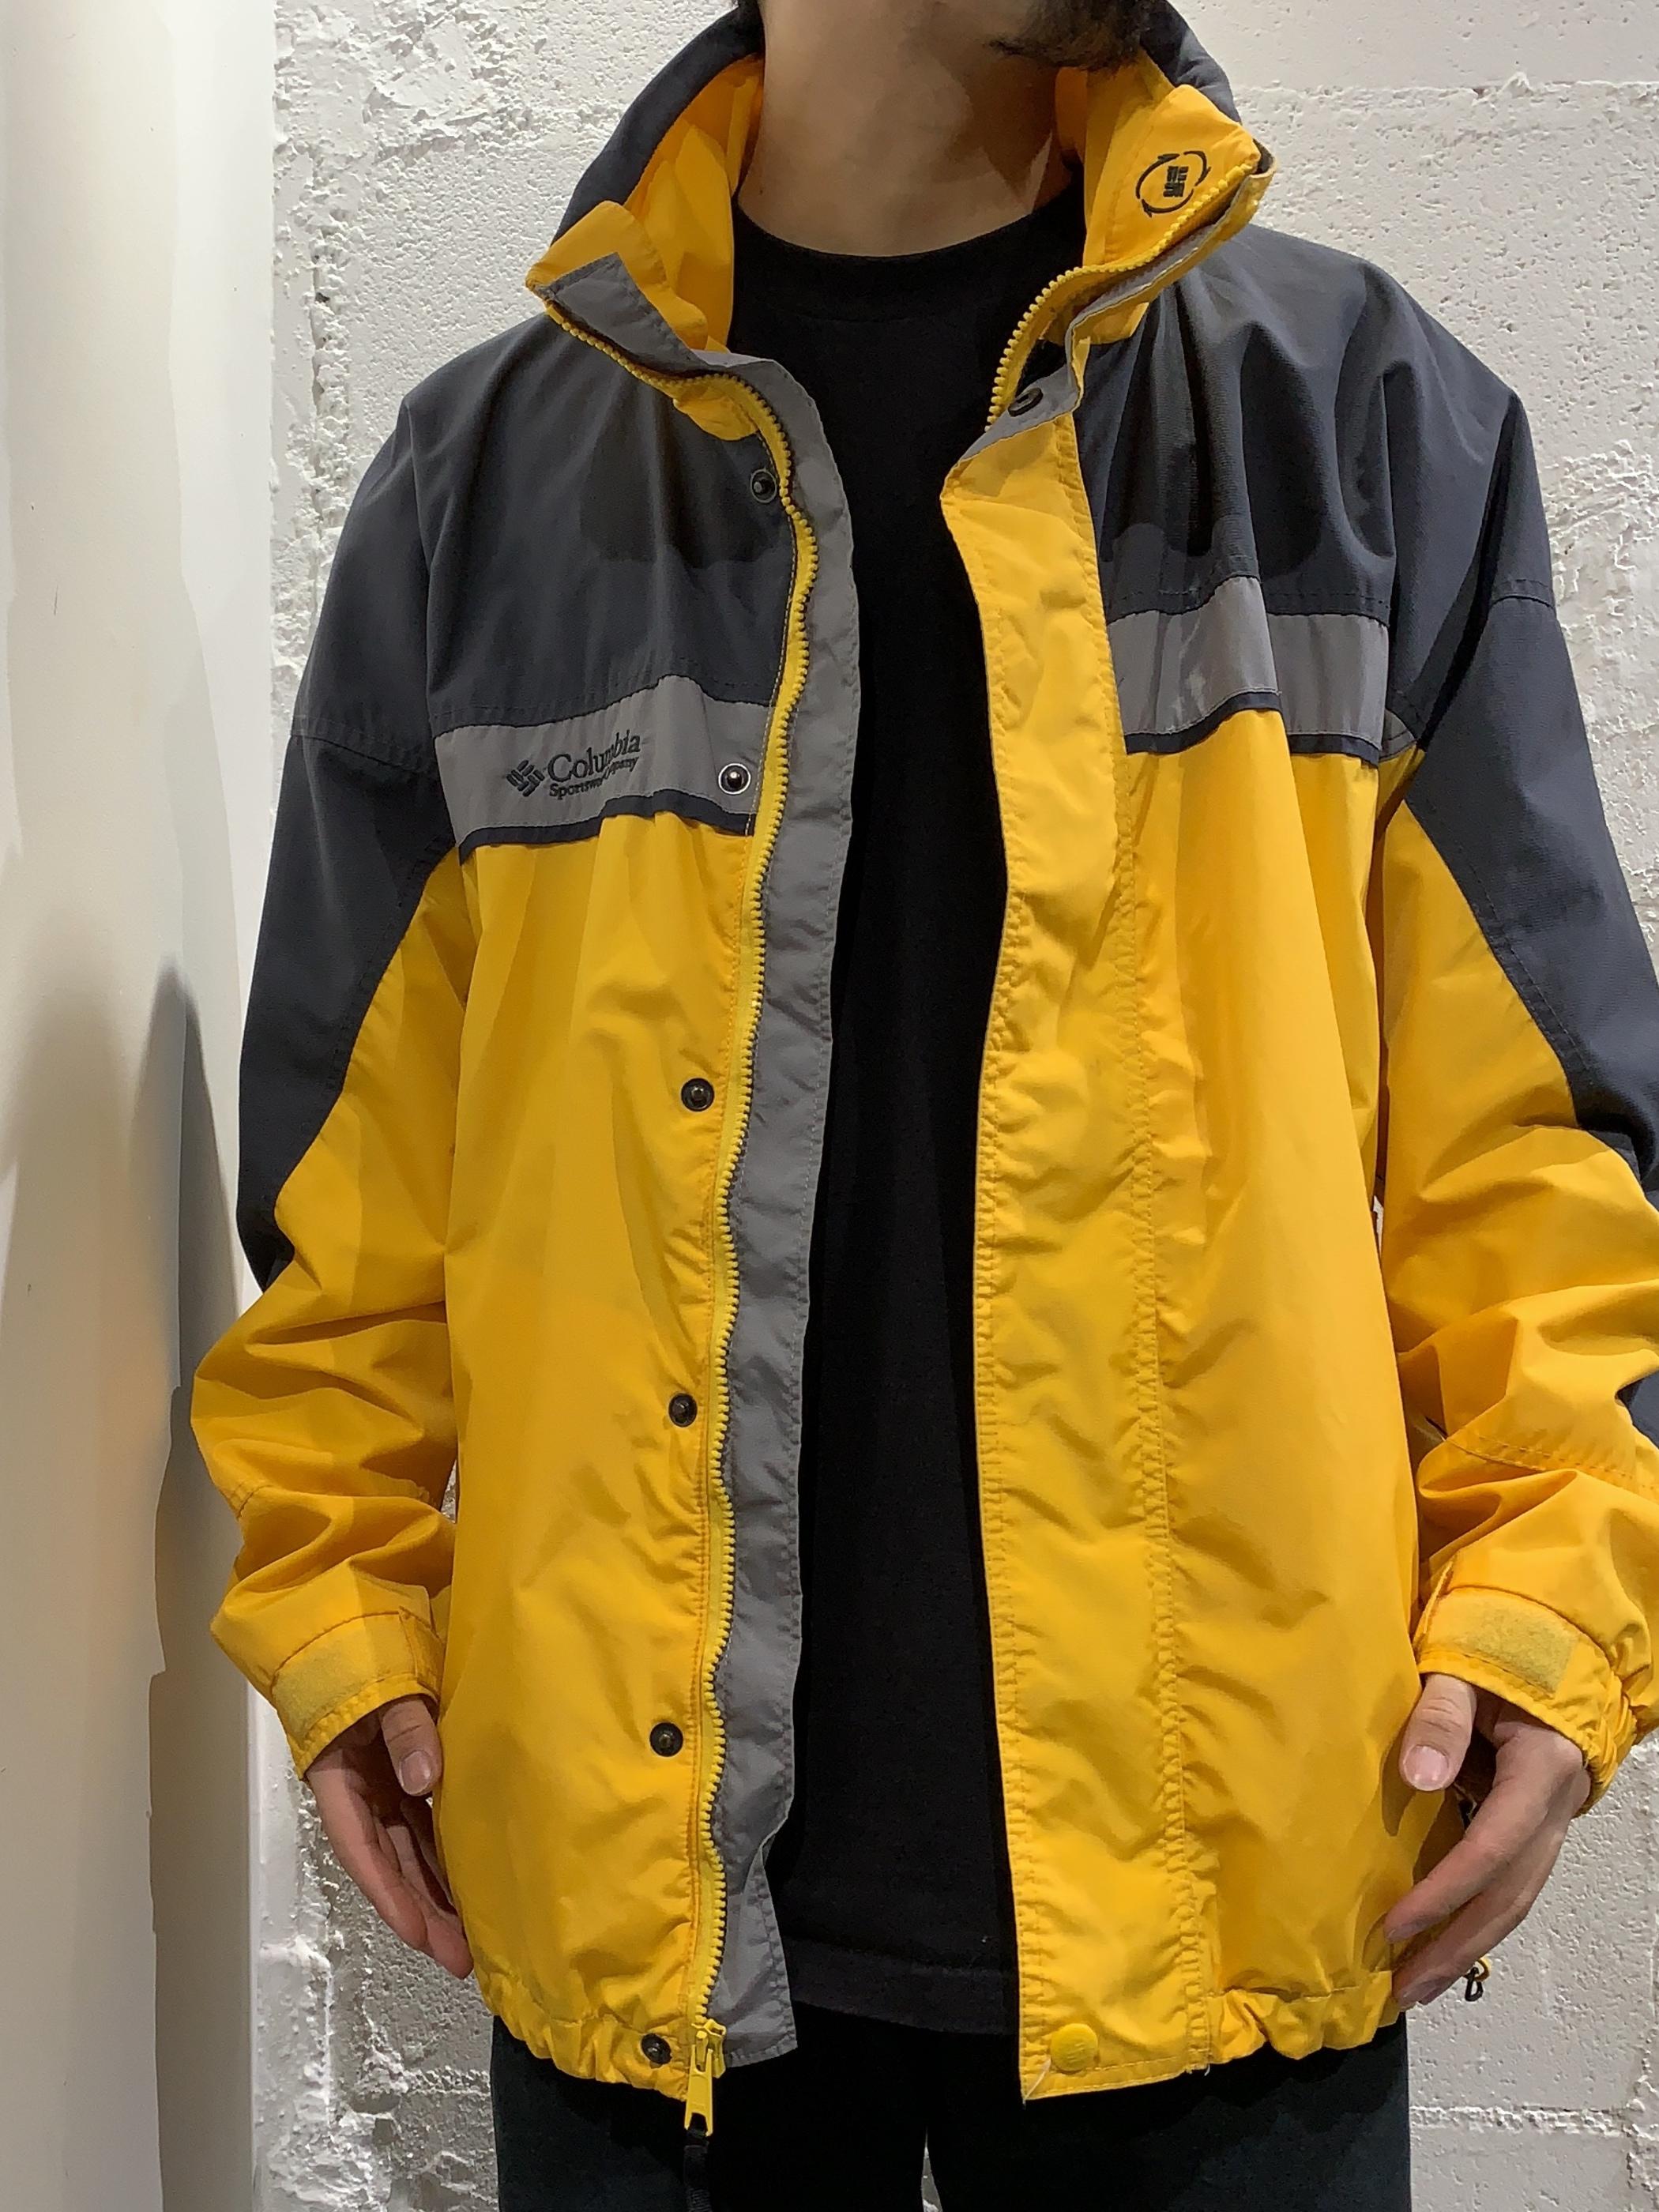 90's Columbia nylon jacket